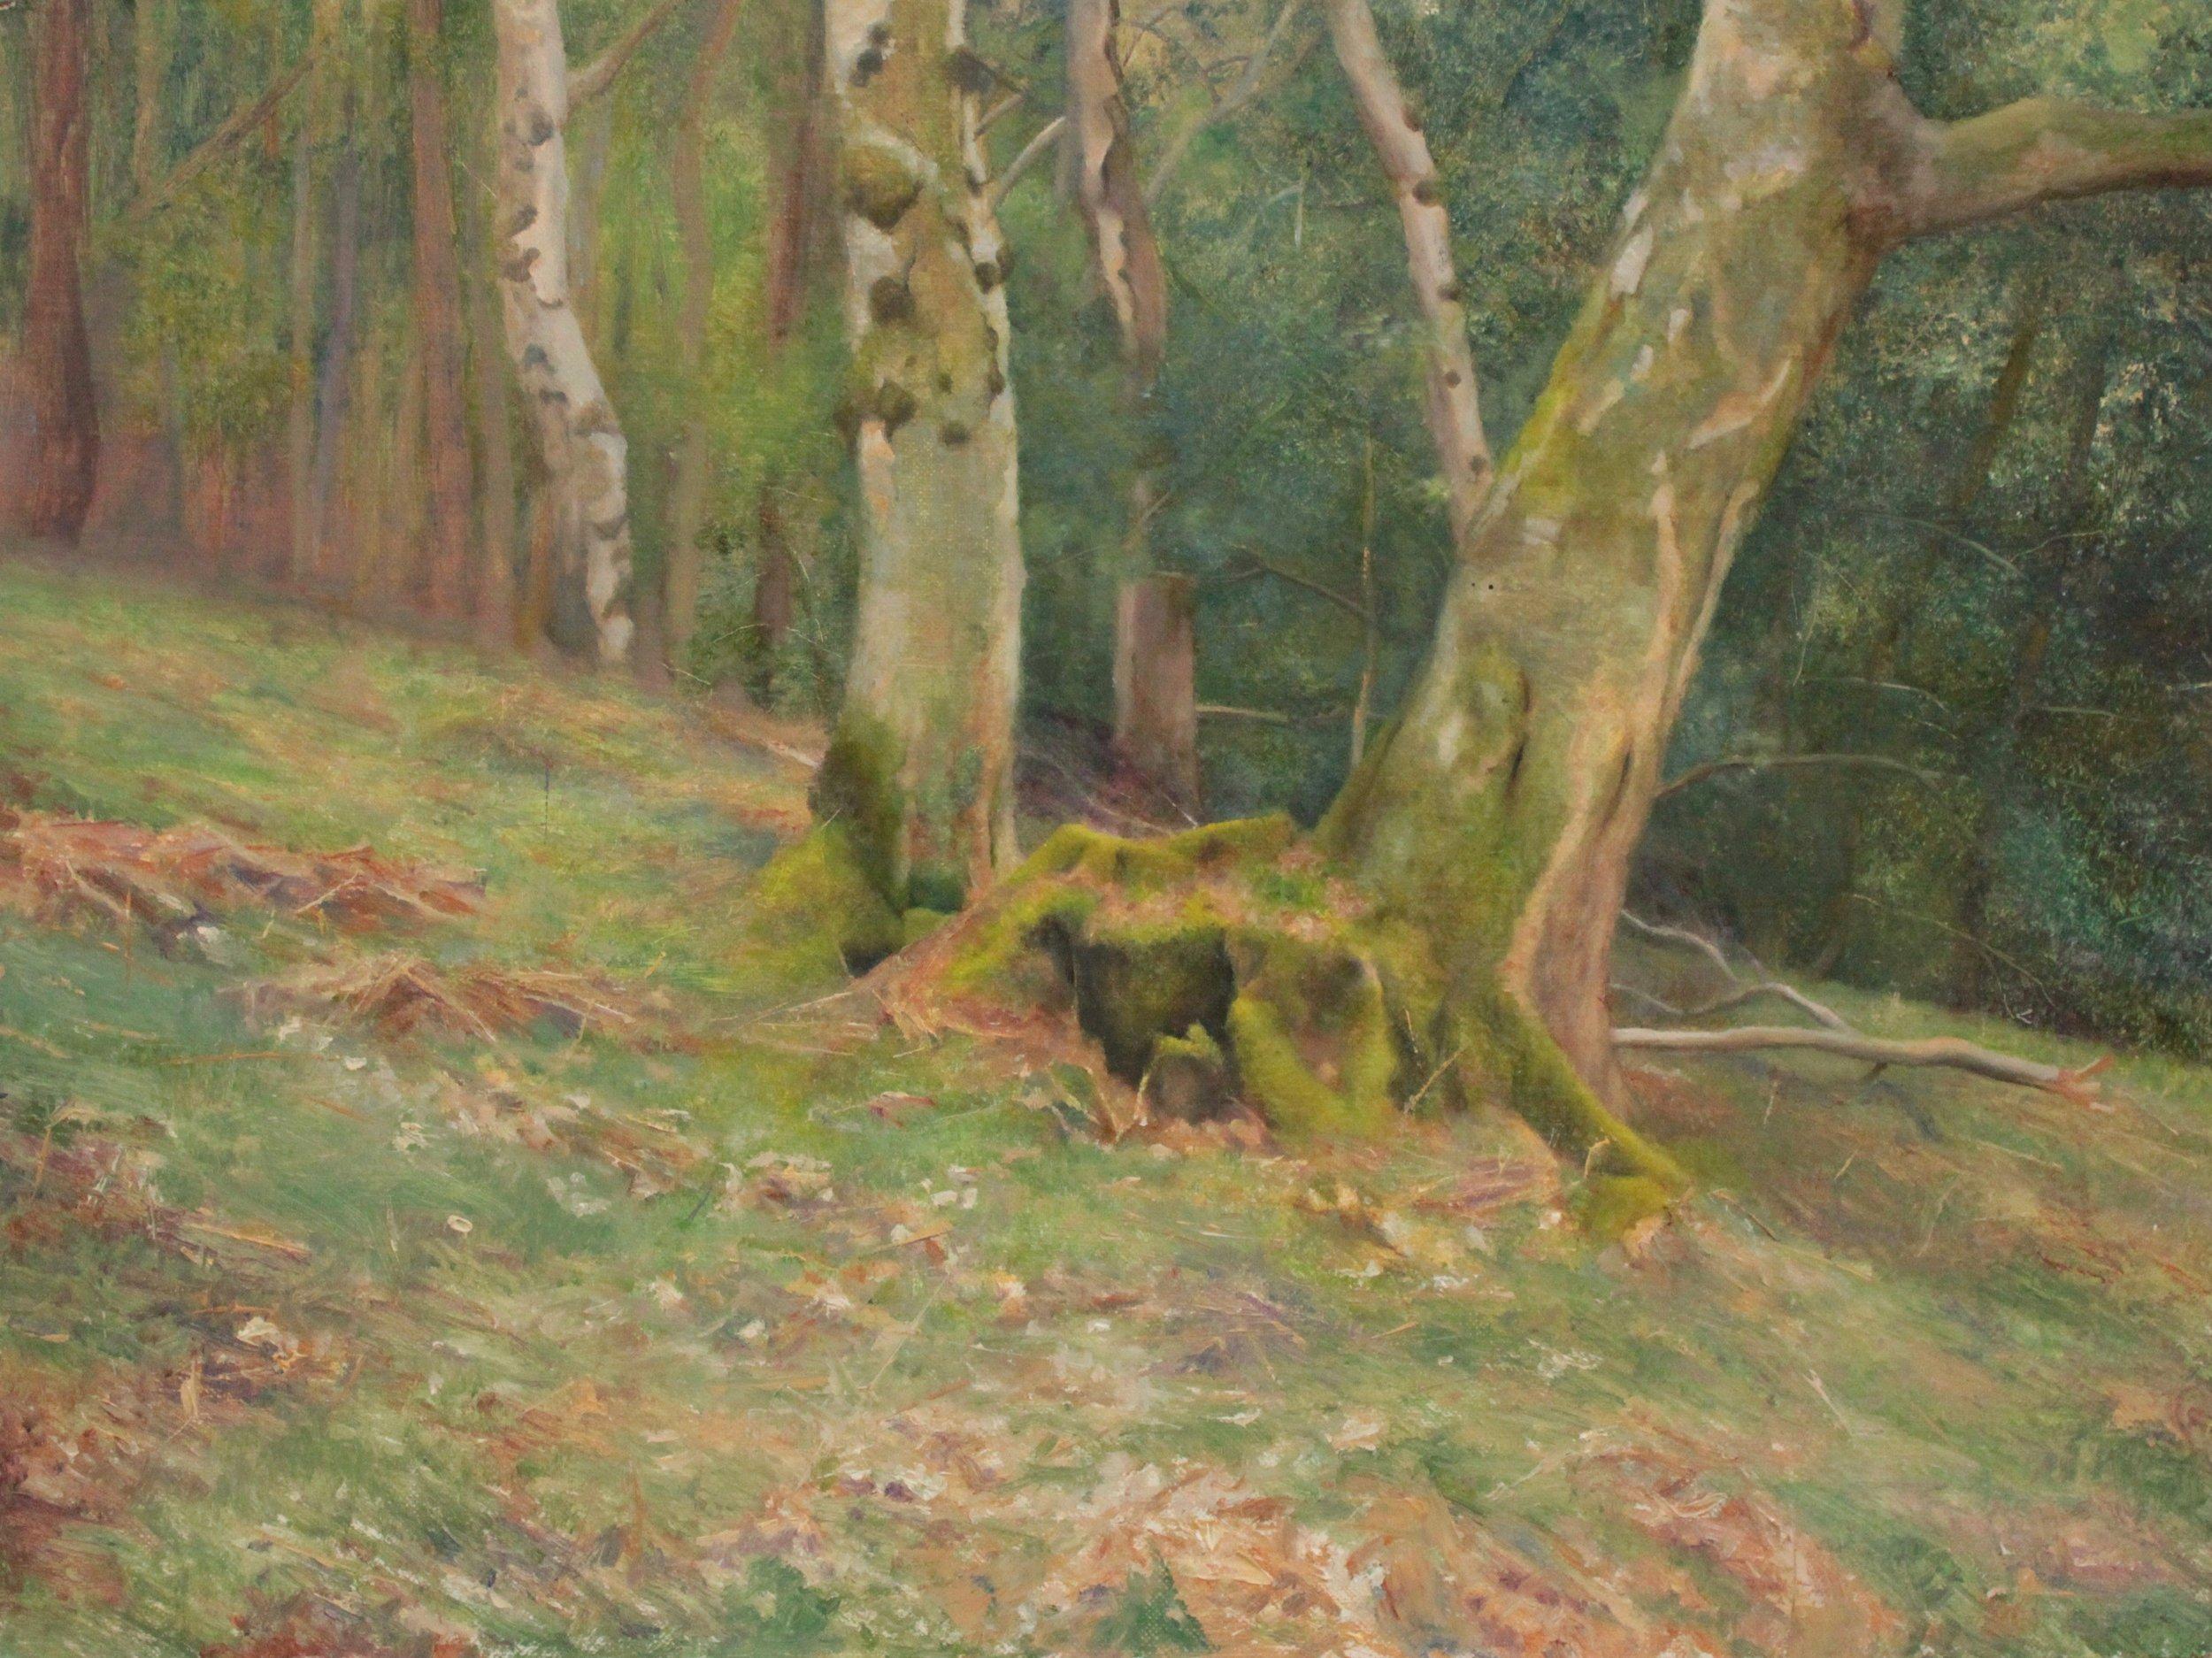 Mossy Tree in Spring , Oil on panel, Chris Polunin